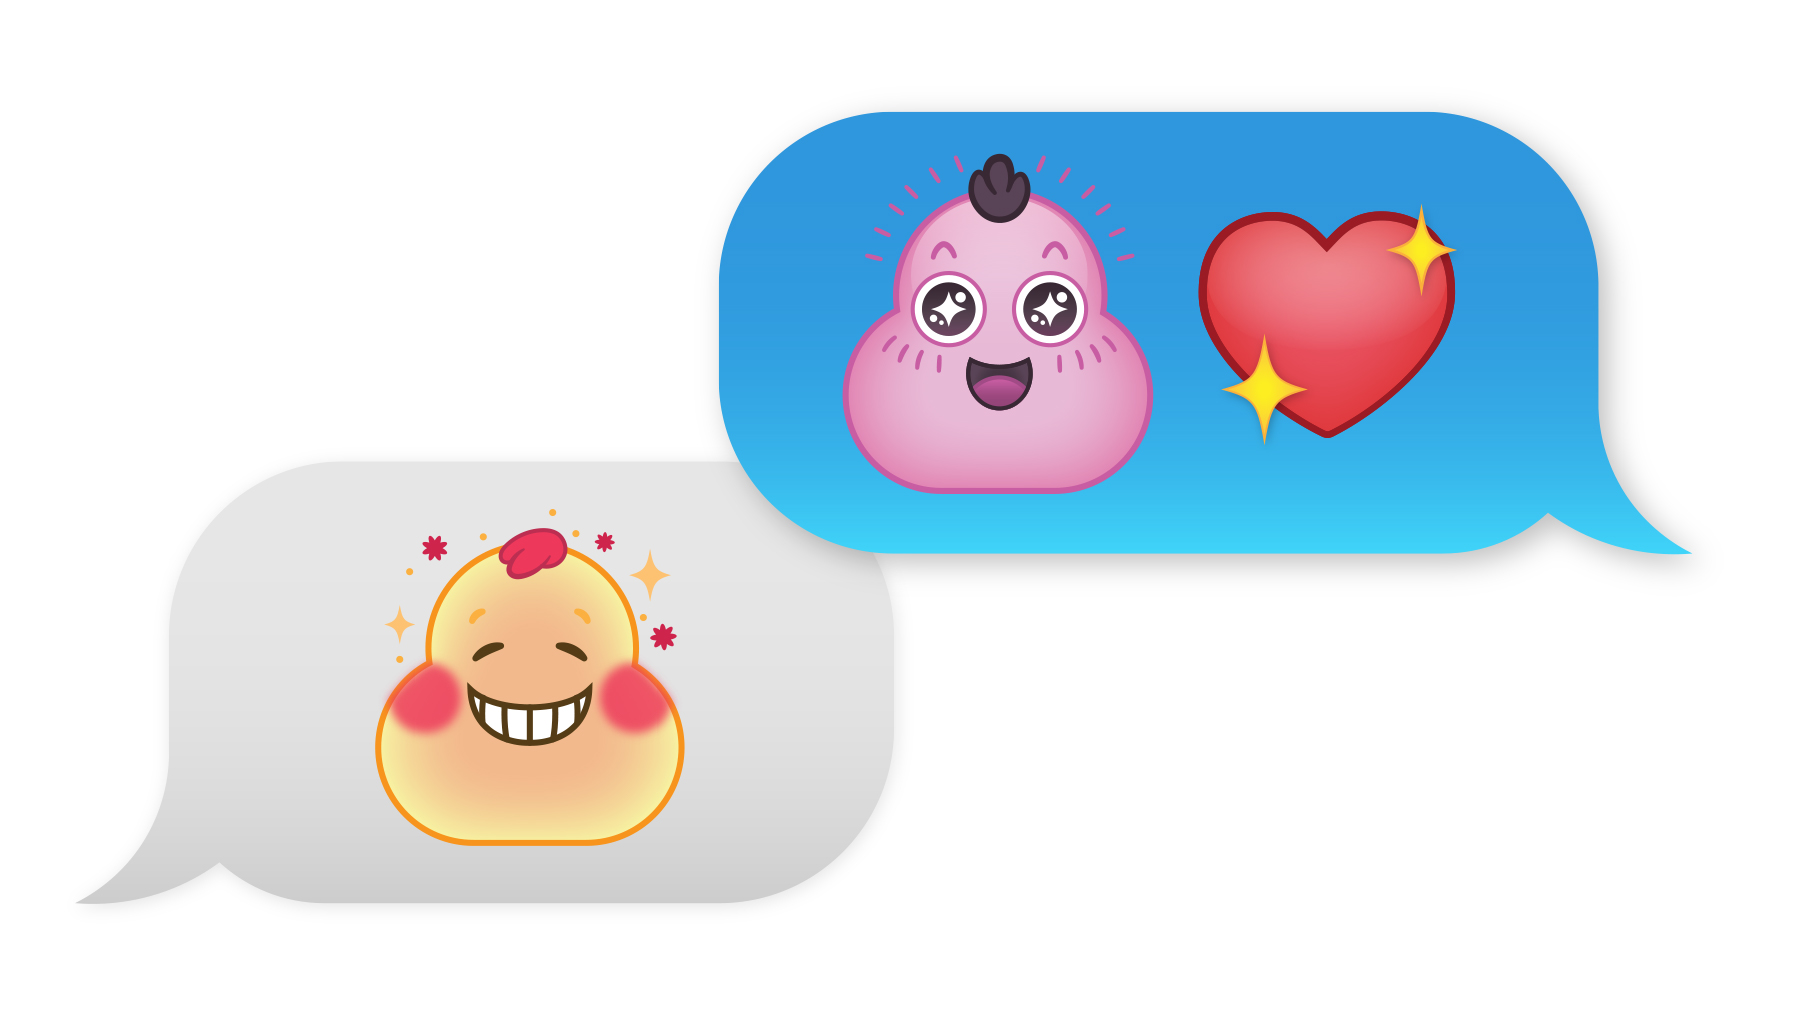 1800x1012 How To Make Your Own Emoji Adobe Illustrator Tutorials